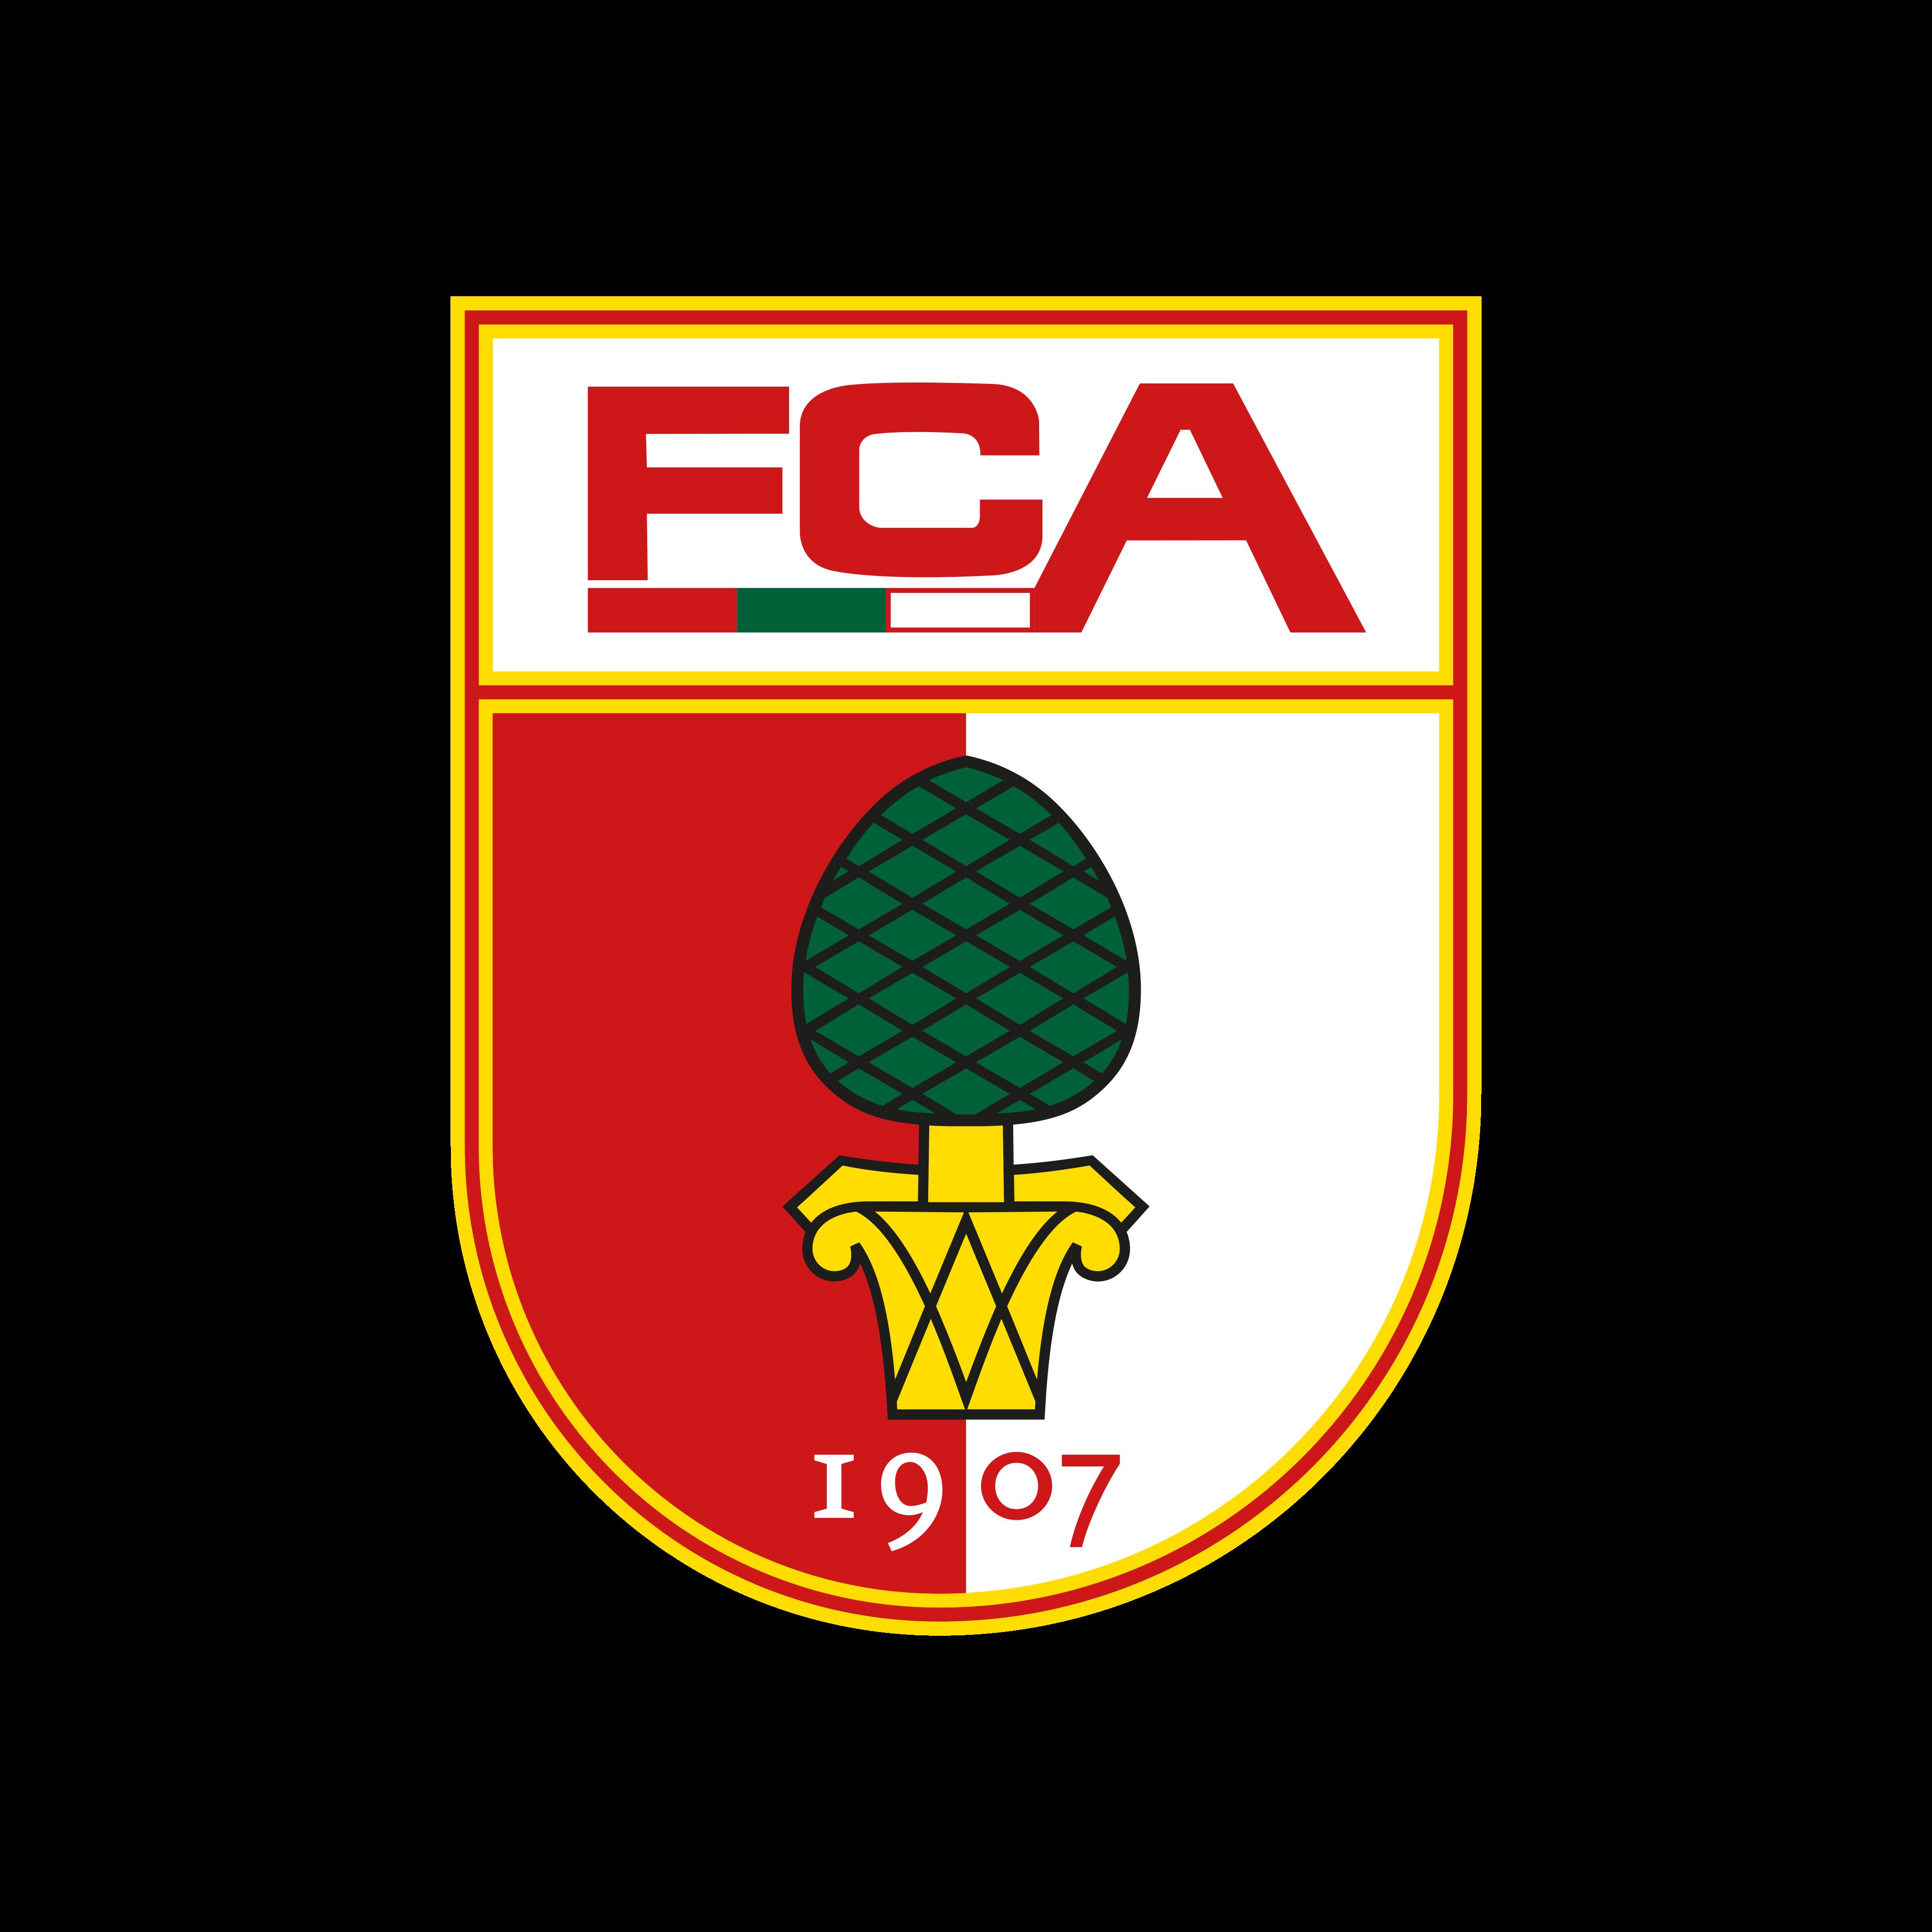 fc augsburg logo 0 - FC Augsburg Logo